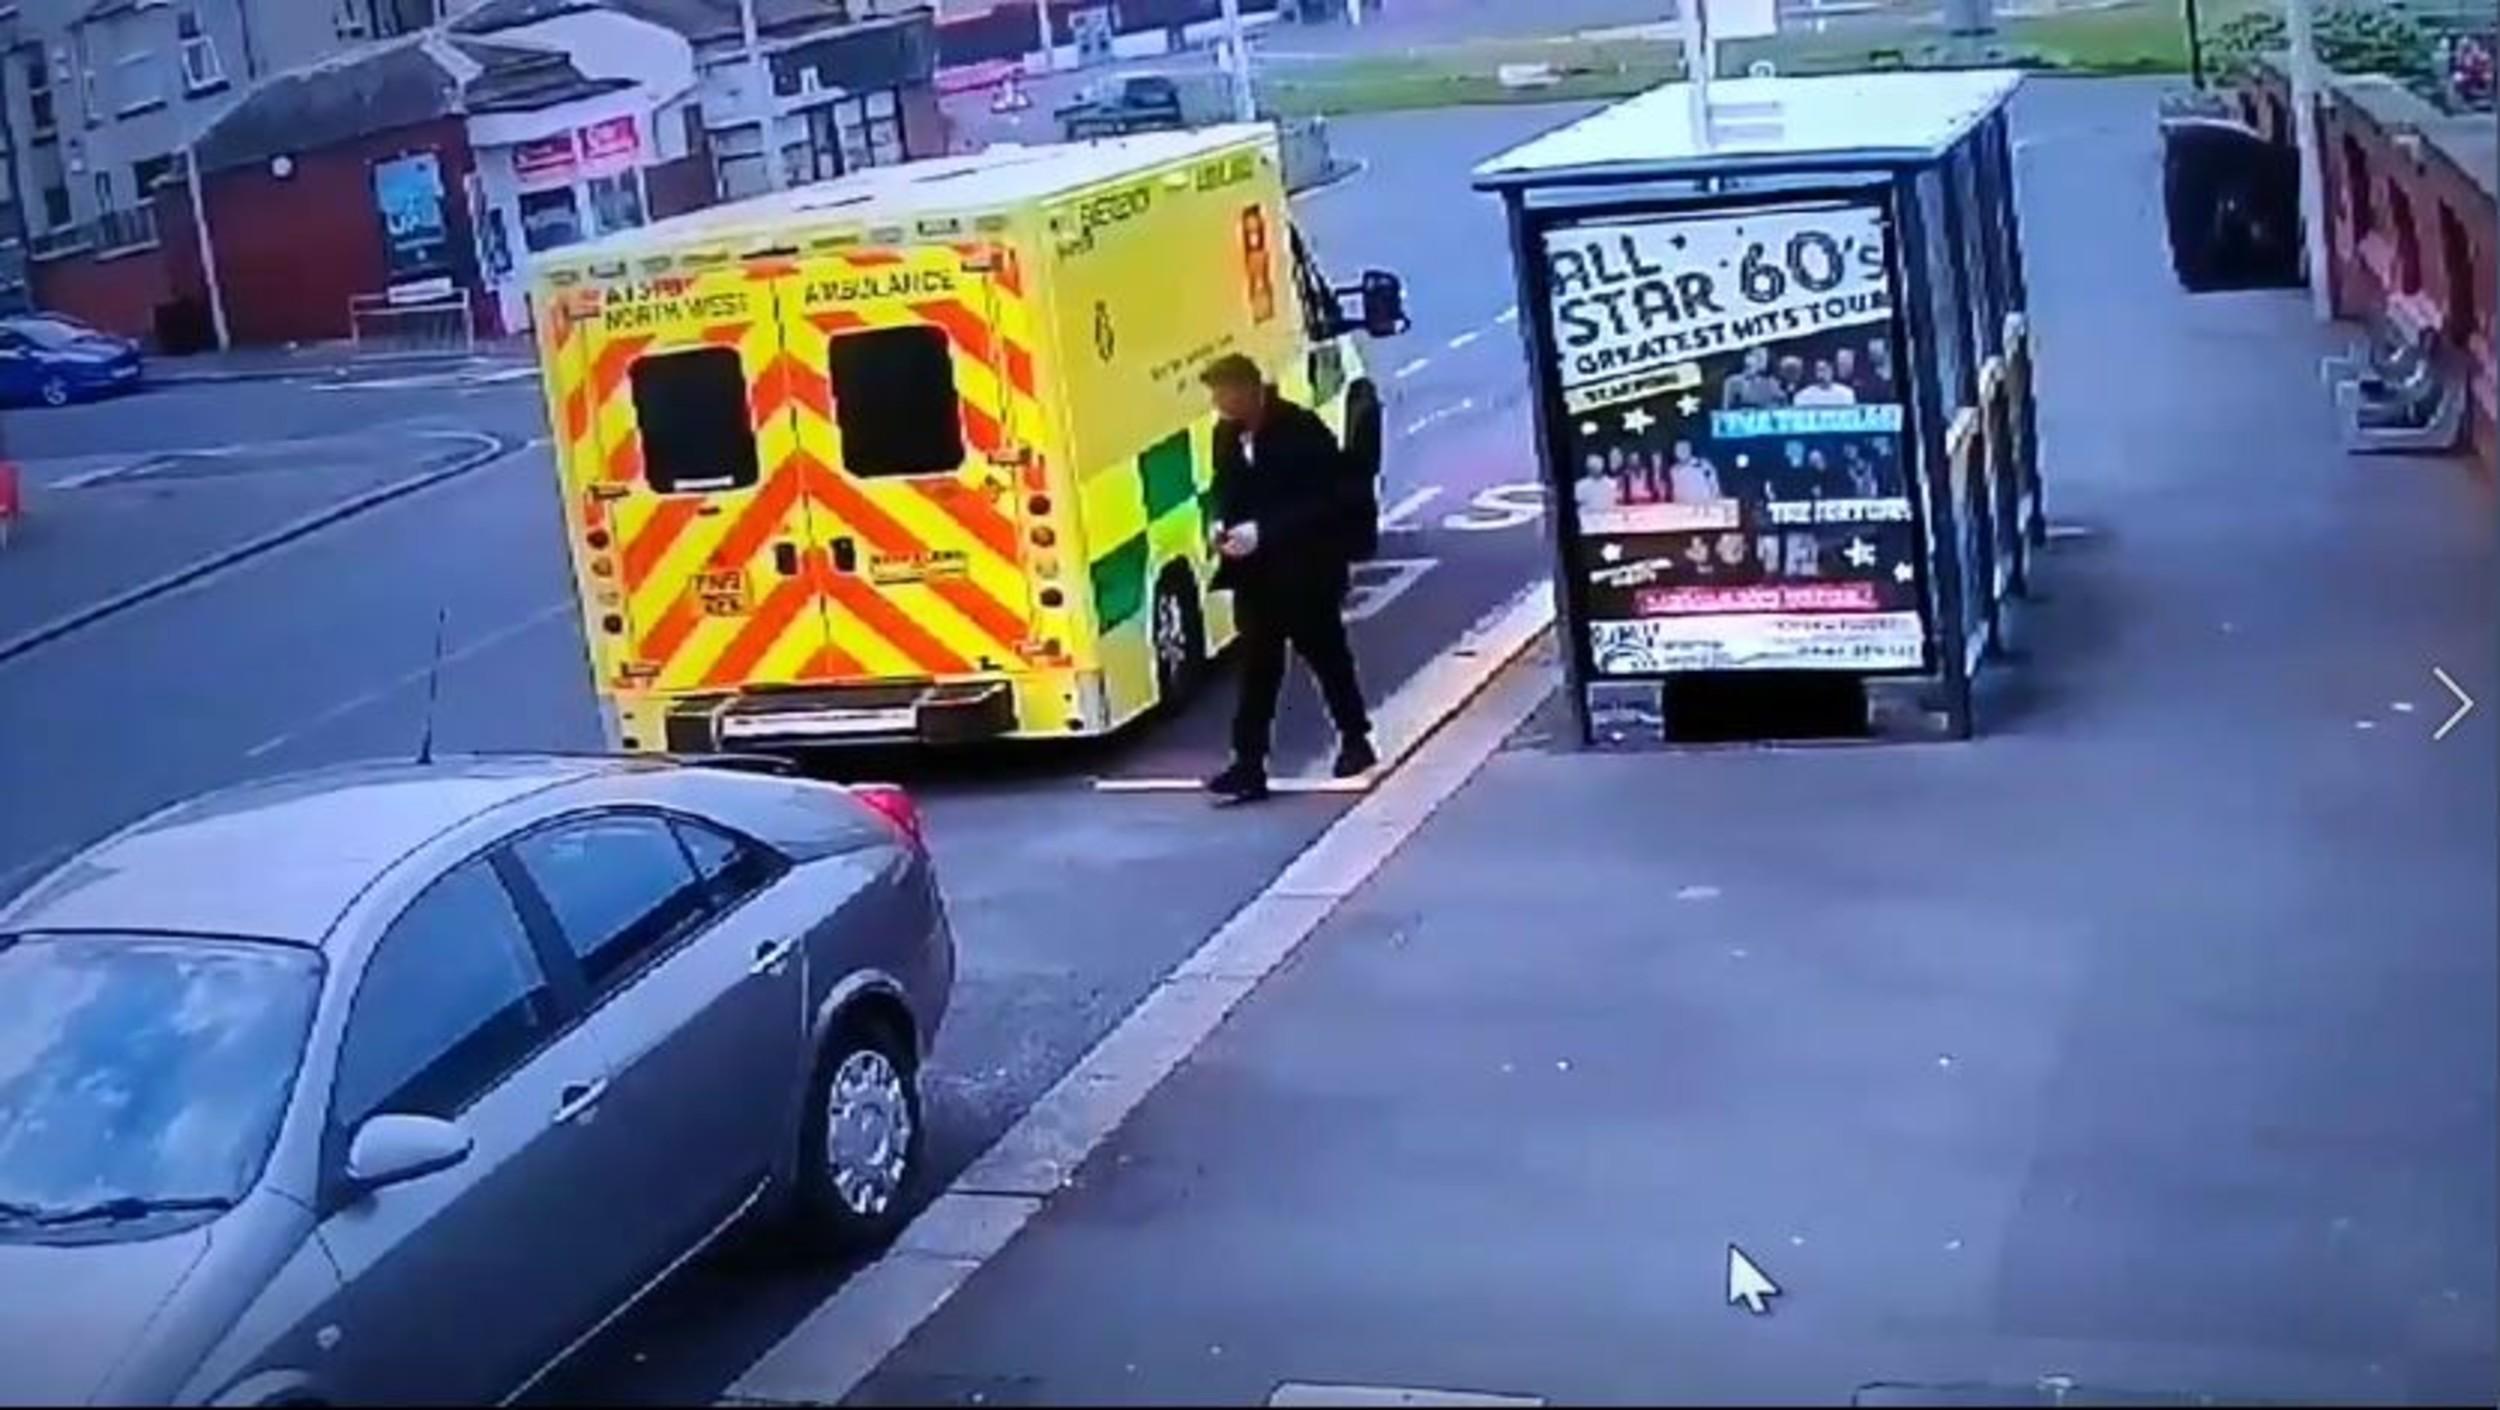 A man wandering outside an ambulance| By Deadline News, Viral Video News